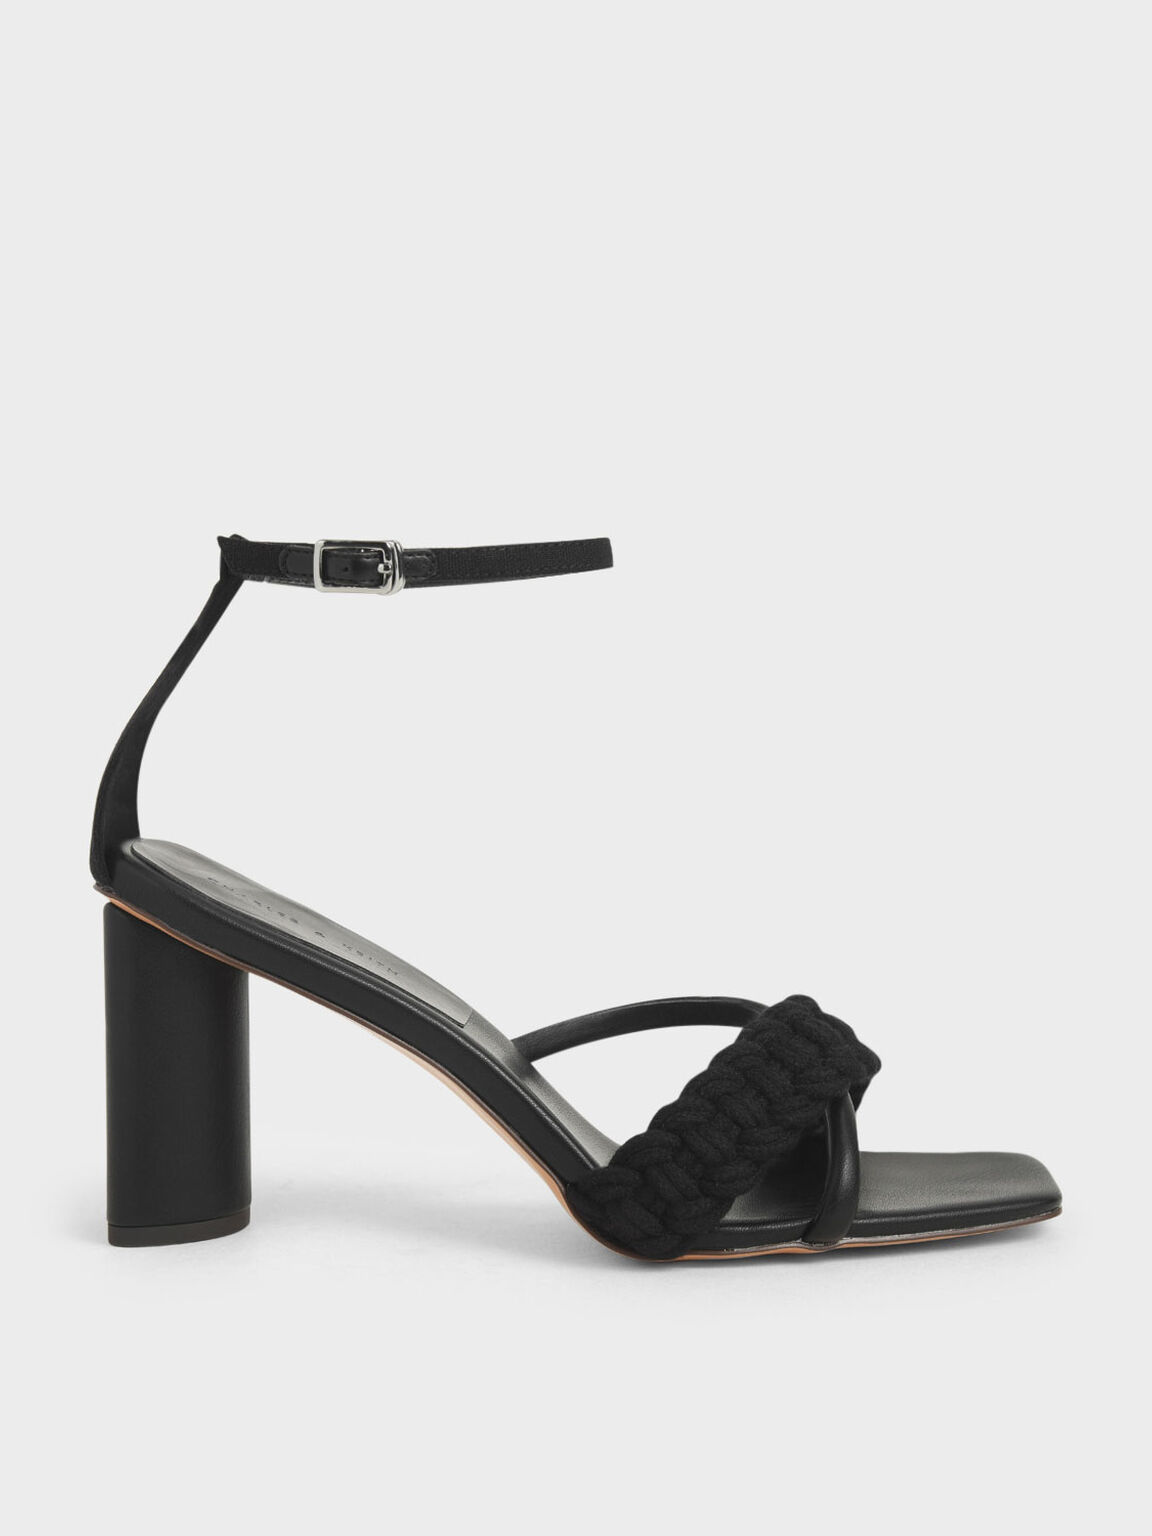 Rope Cylindrical Heeled Sandals, Black, hi-res